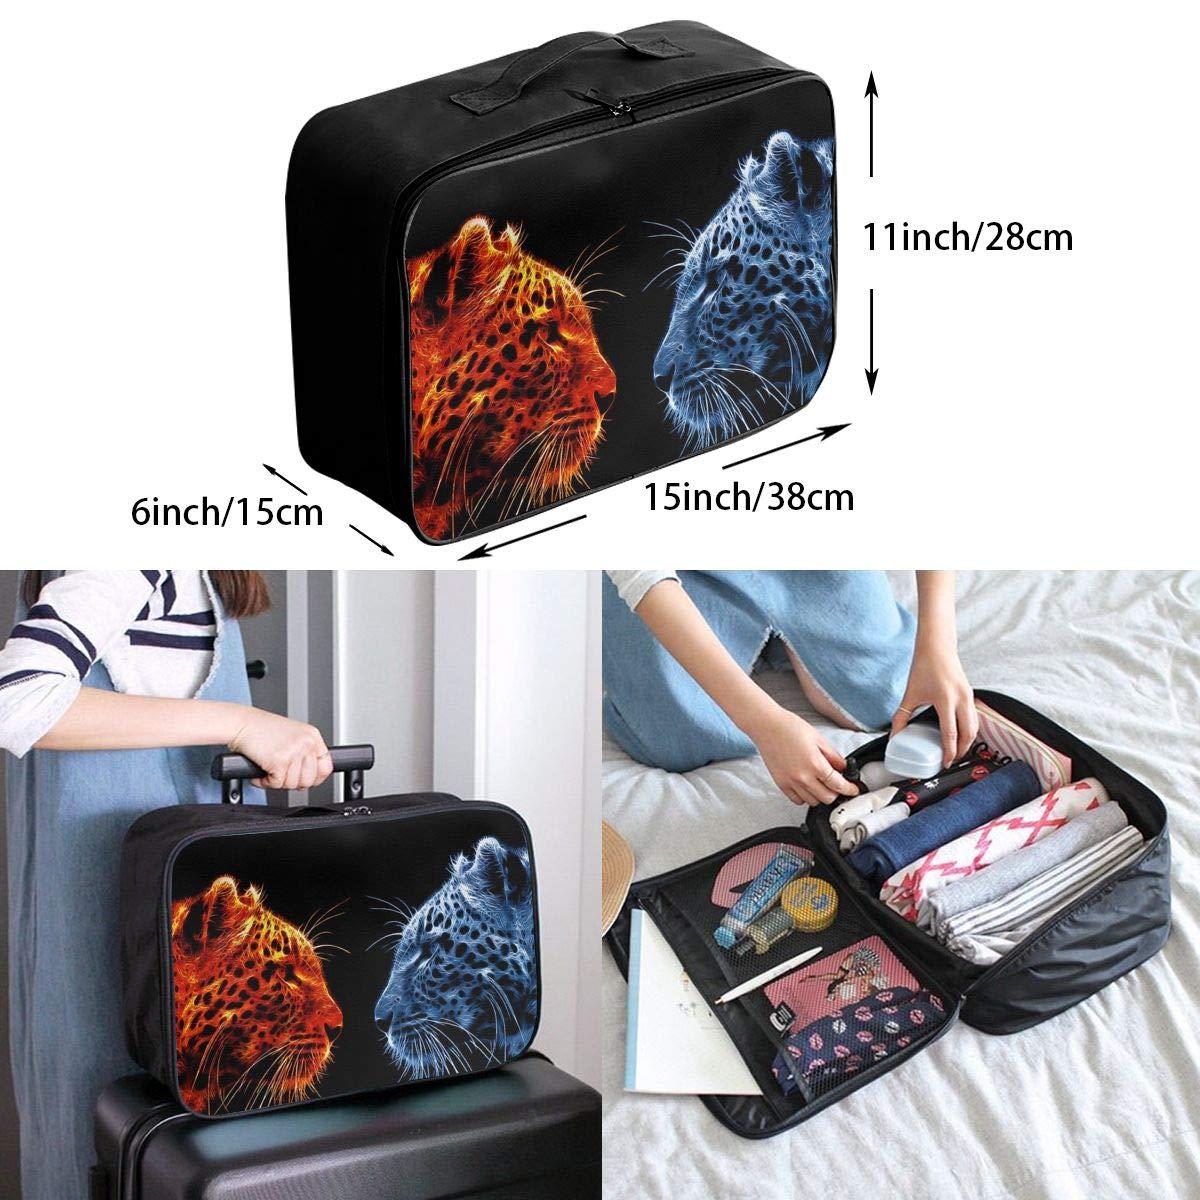 Travel Luggage Duffle Bag Lightweight Portable Handbag Blue Tiger Tiger Pattern Large Capacity Waterproof Foldable Storage Tote